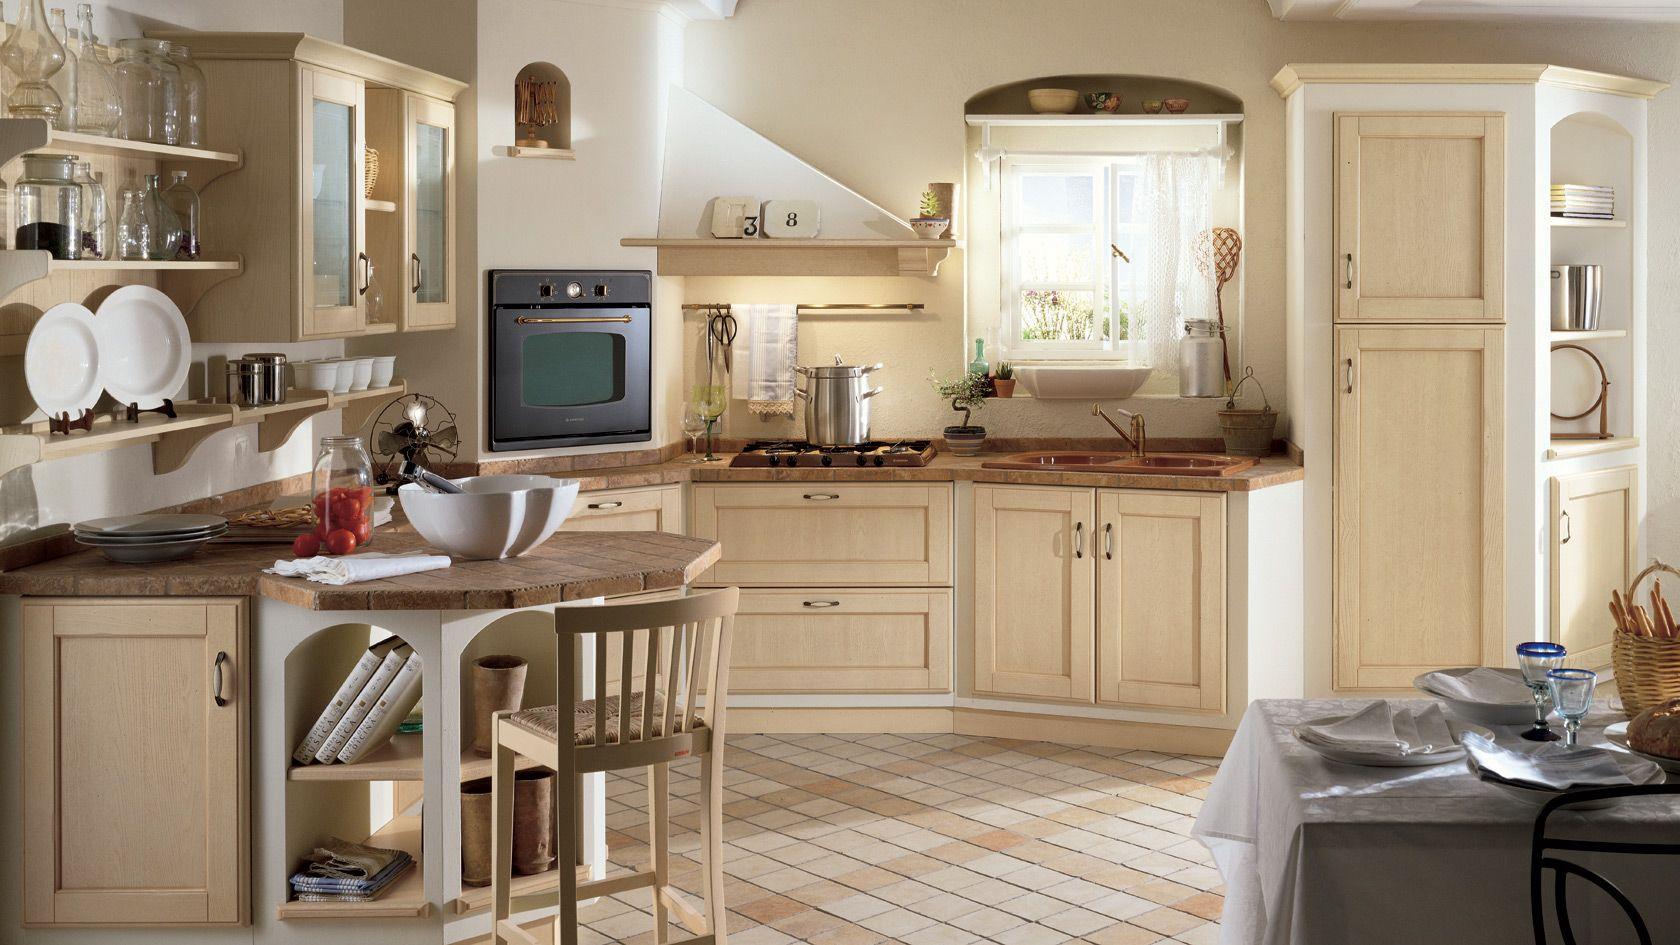 scavolini | cora | Kitchen & Dining | Pinterest | Cucina, Kitchen ...